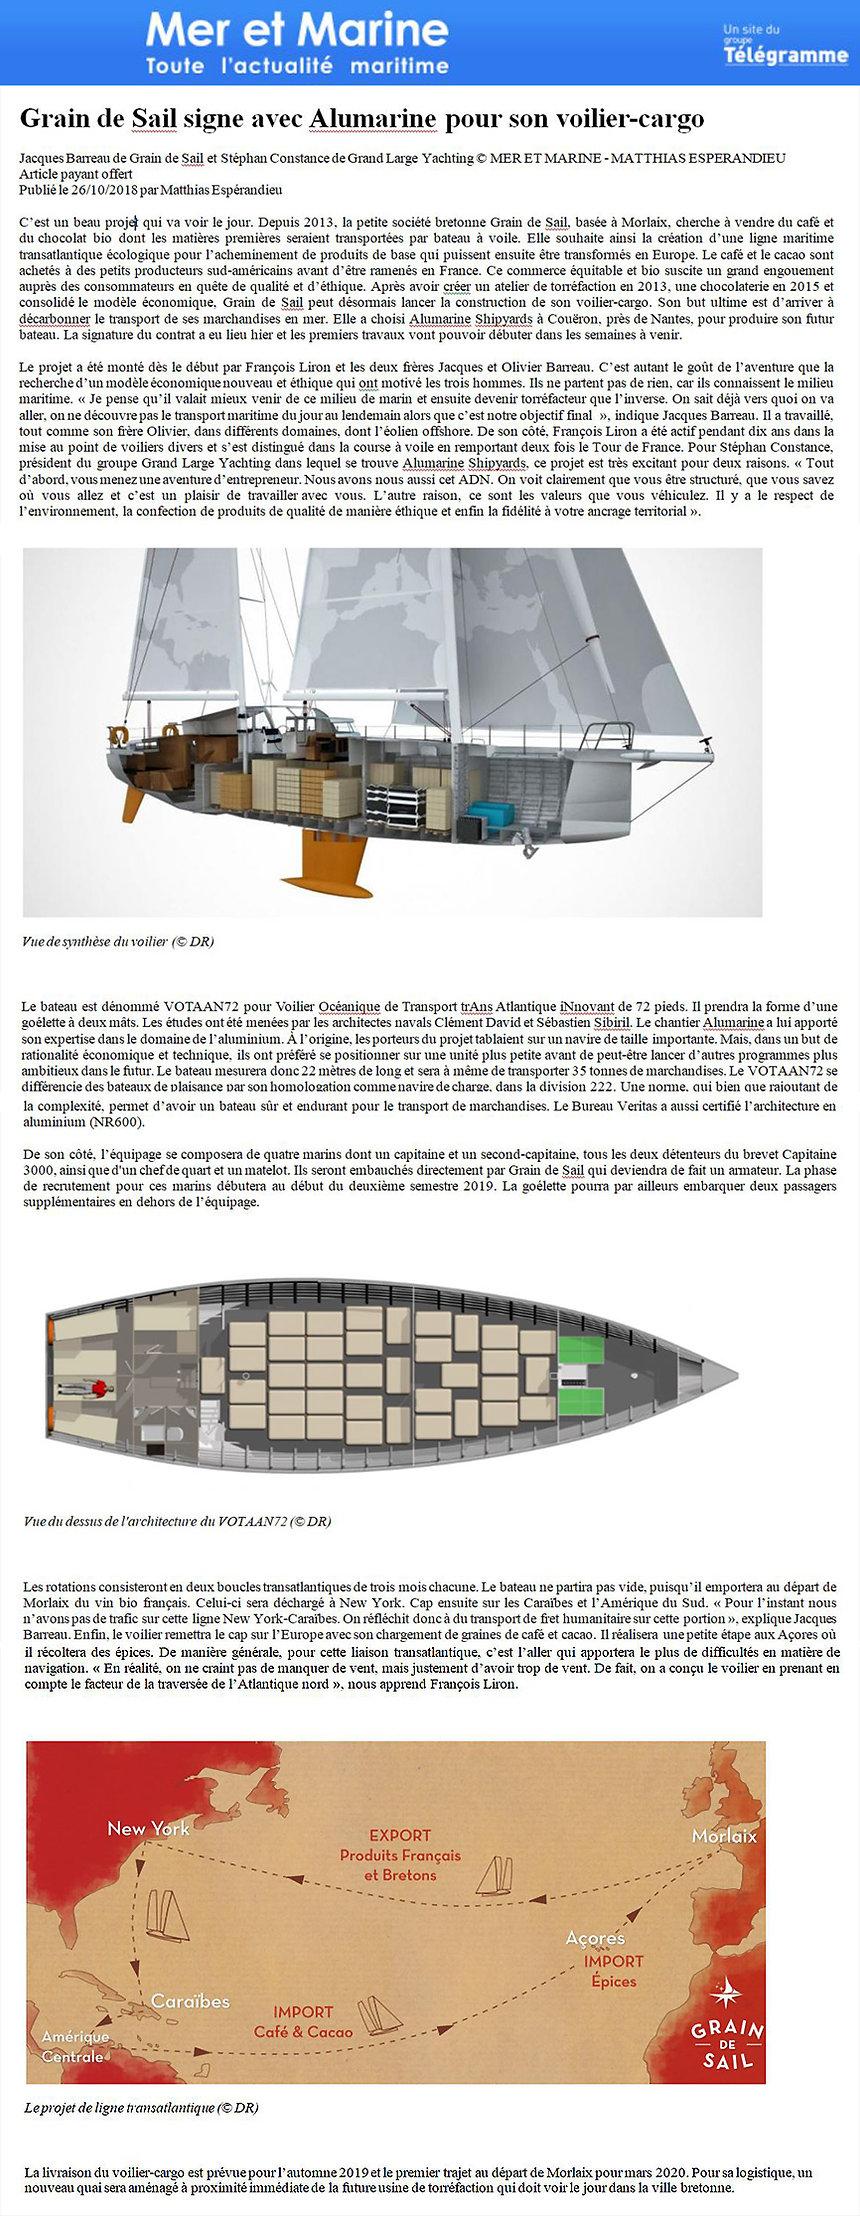 Grain de Sail voilier cargo.jpg